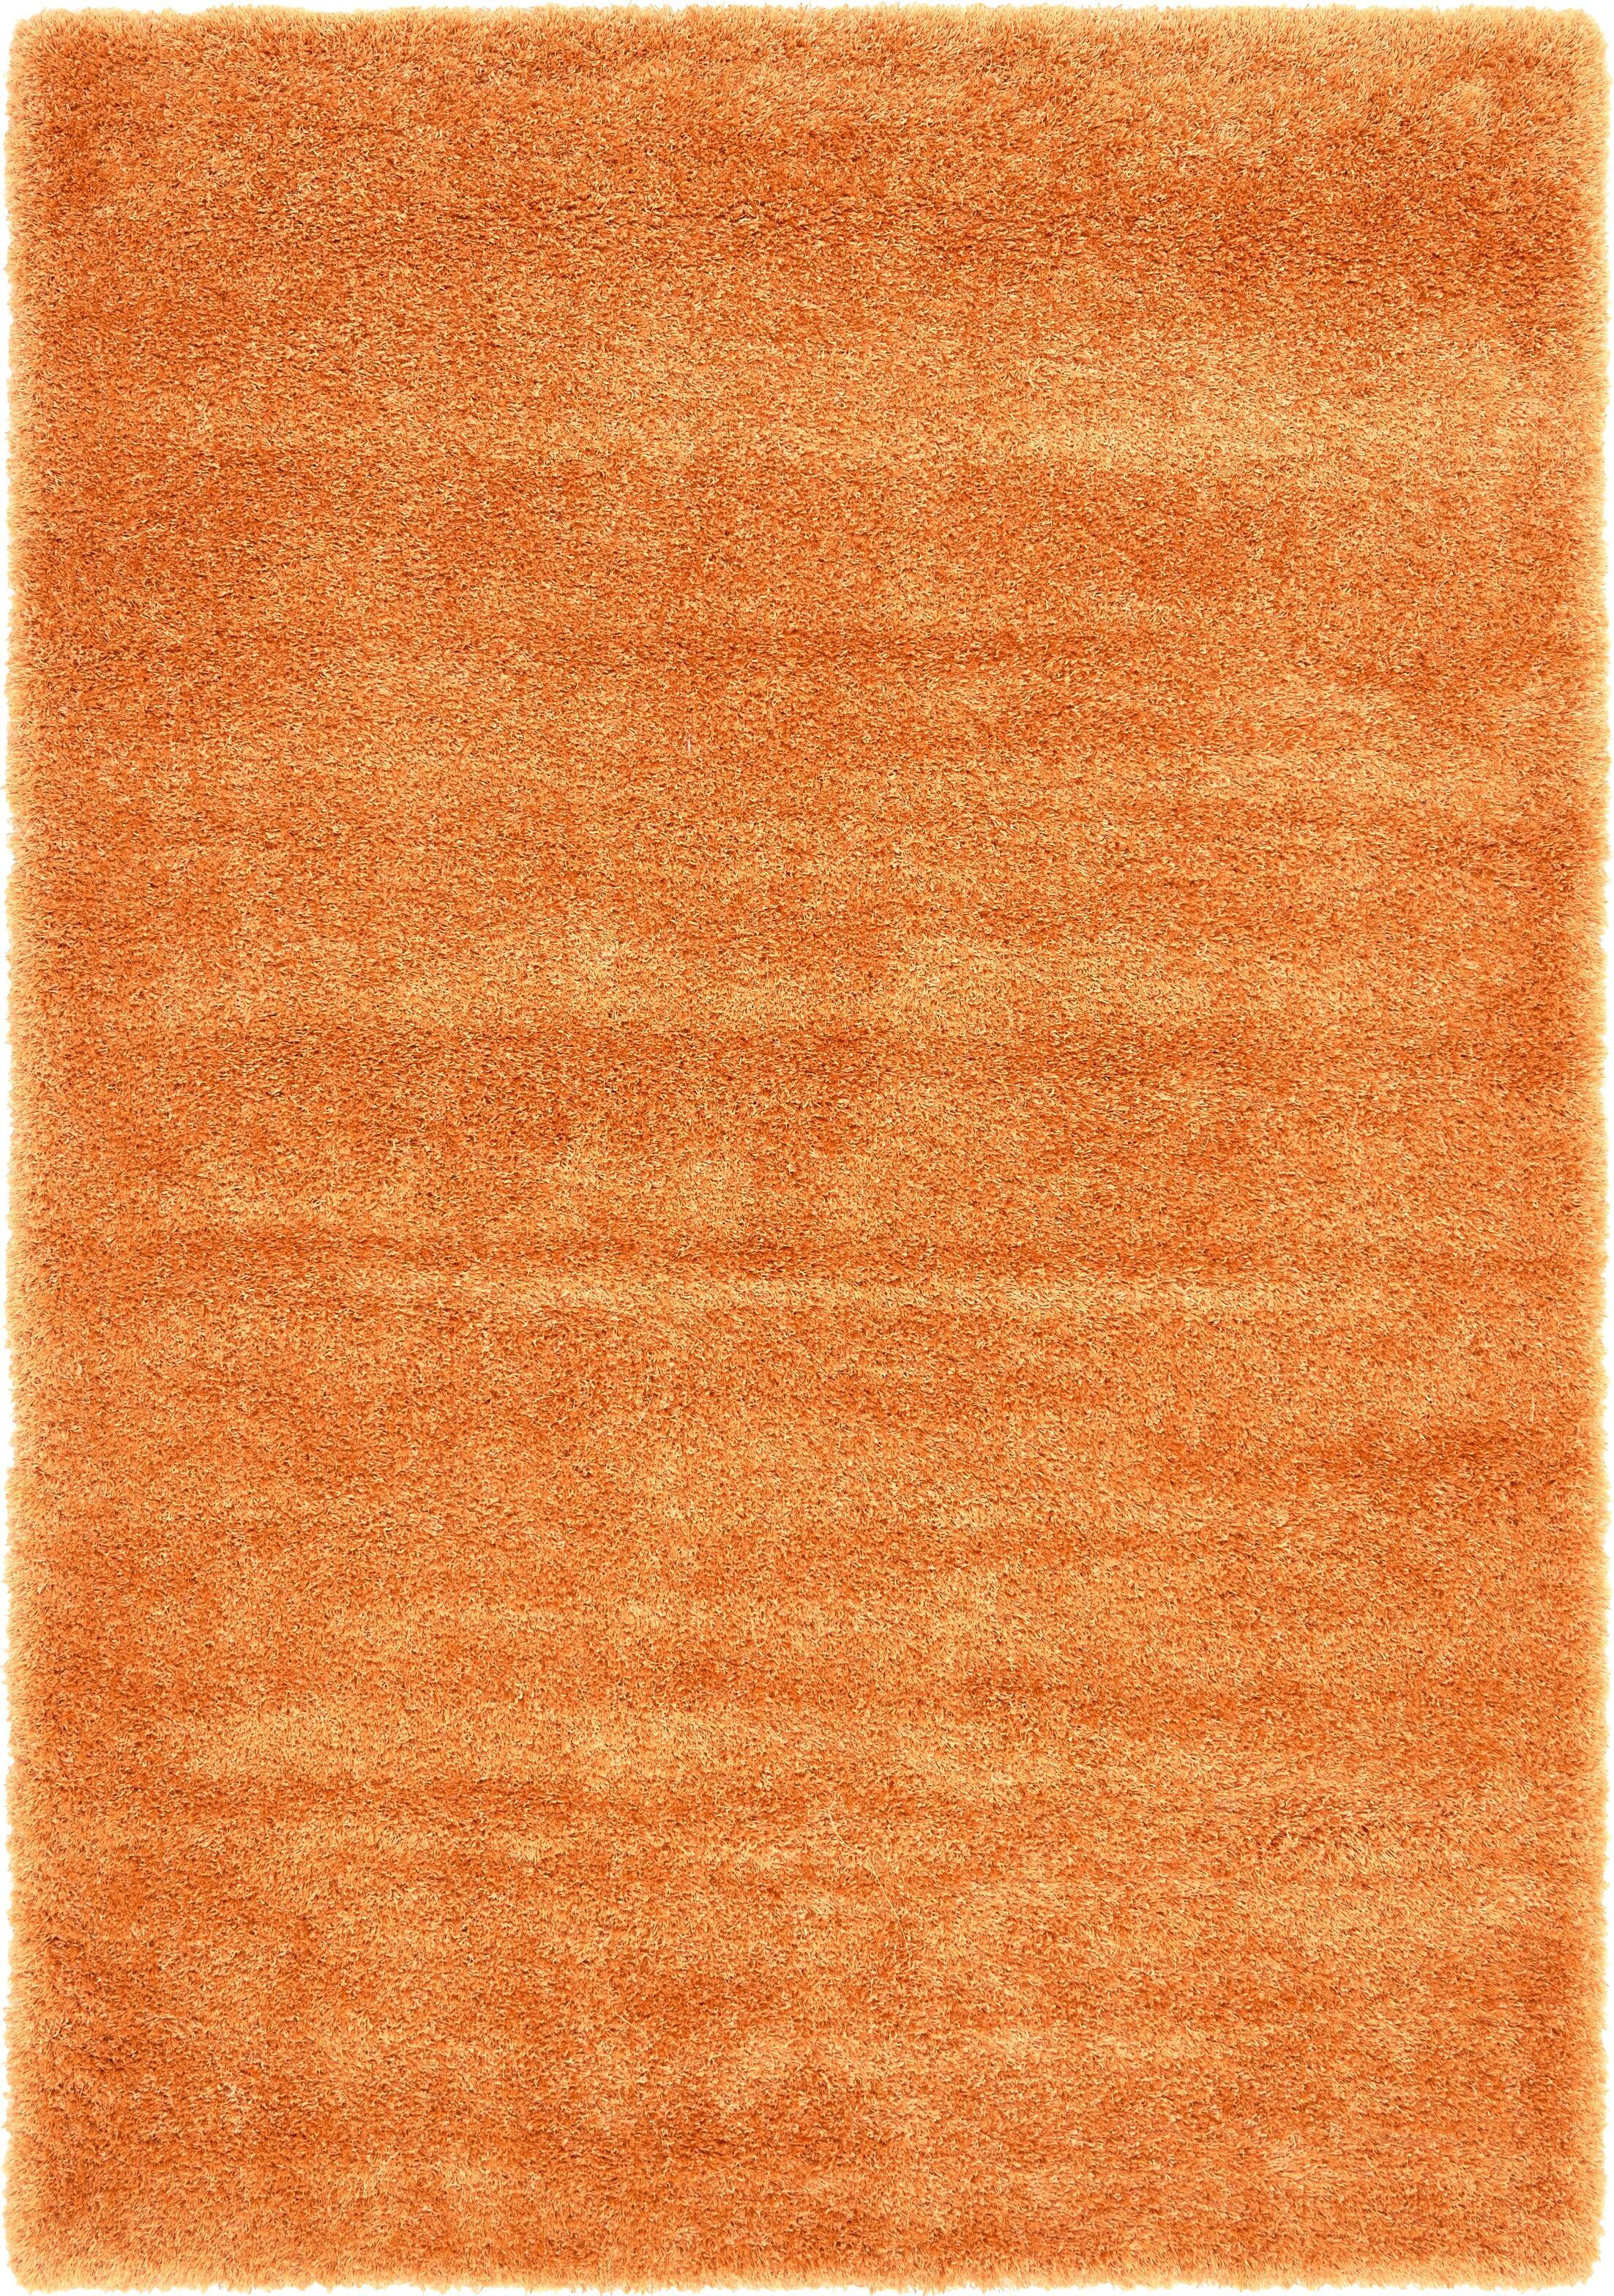 Evelyn Orange Area Rug Rug Size: Rectangle 6' x 9'